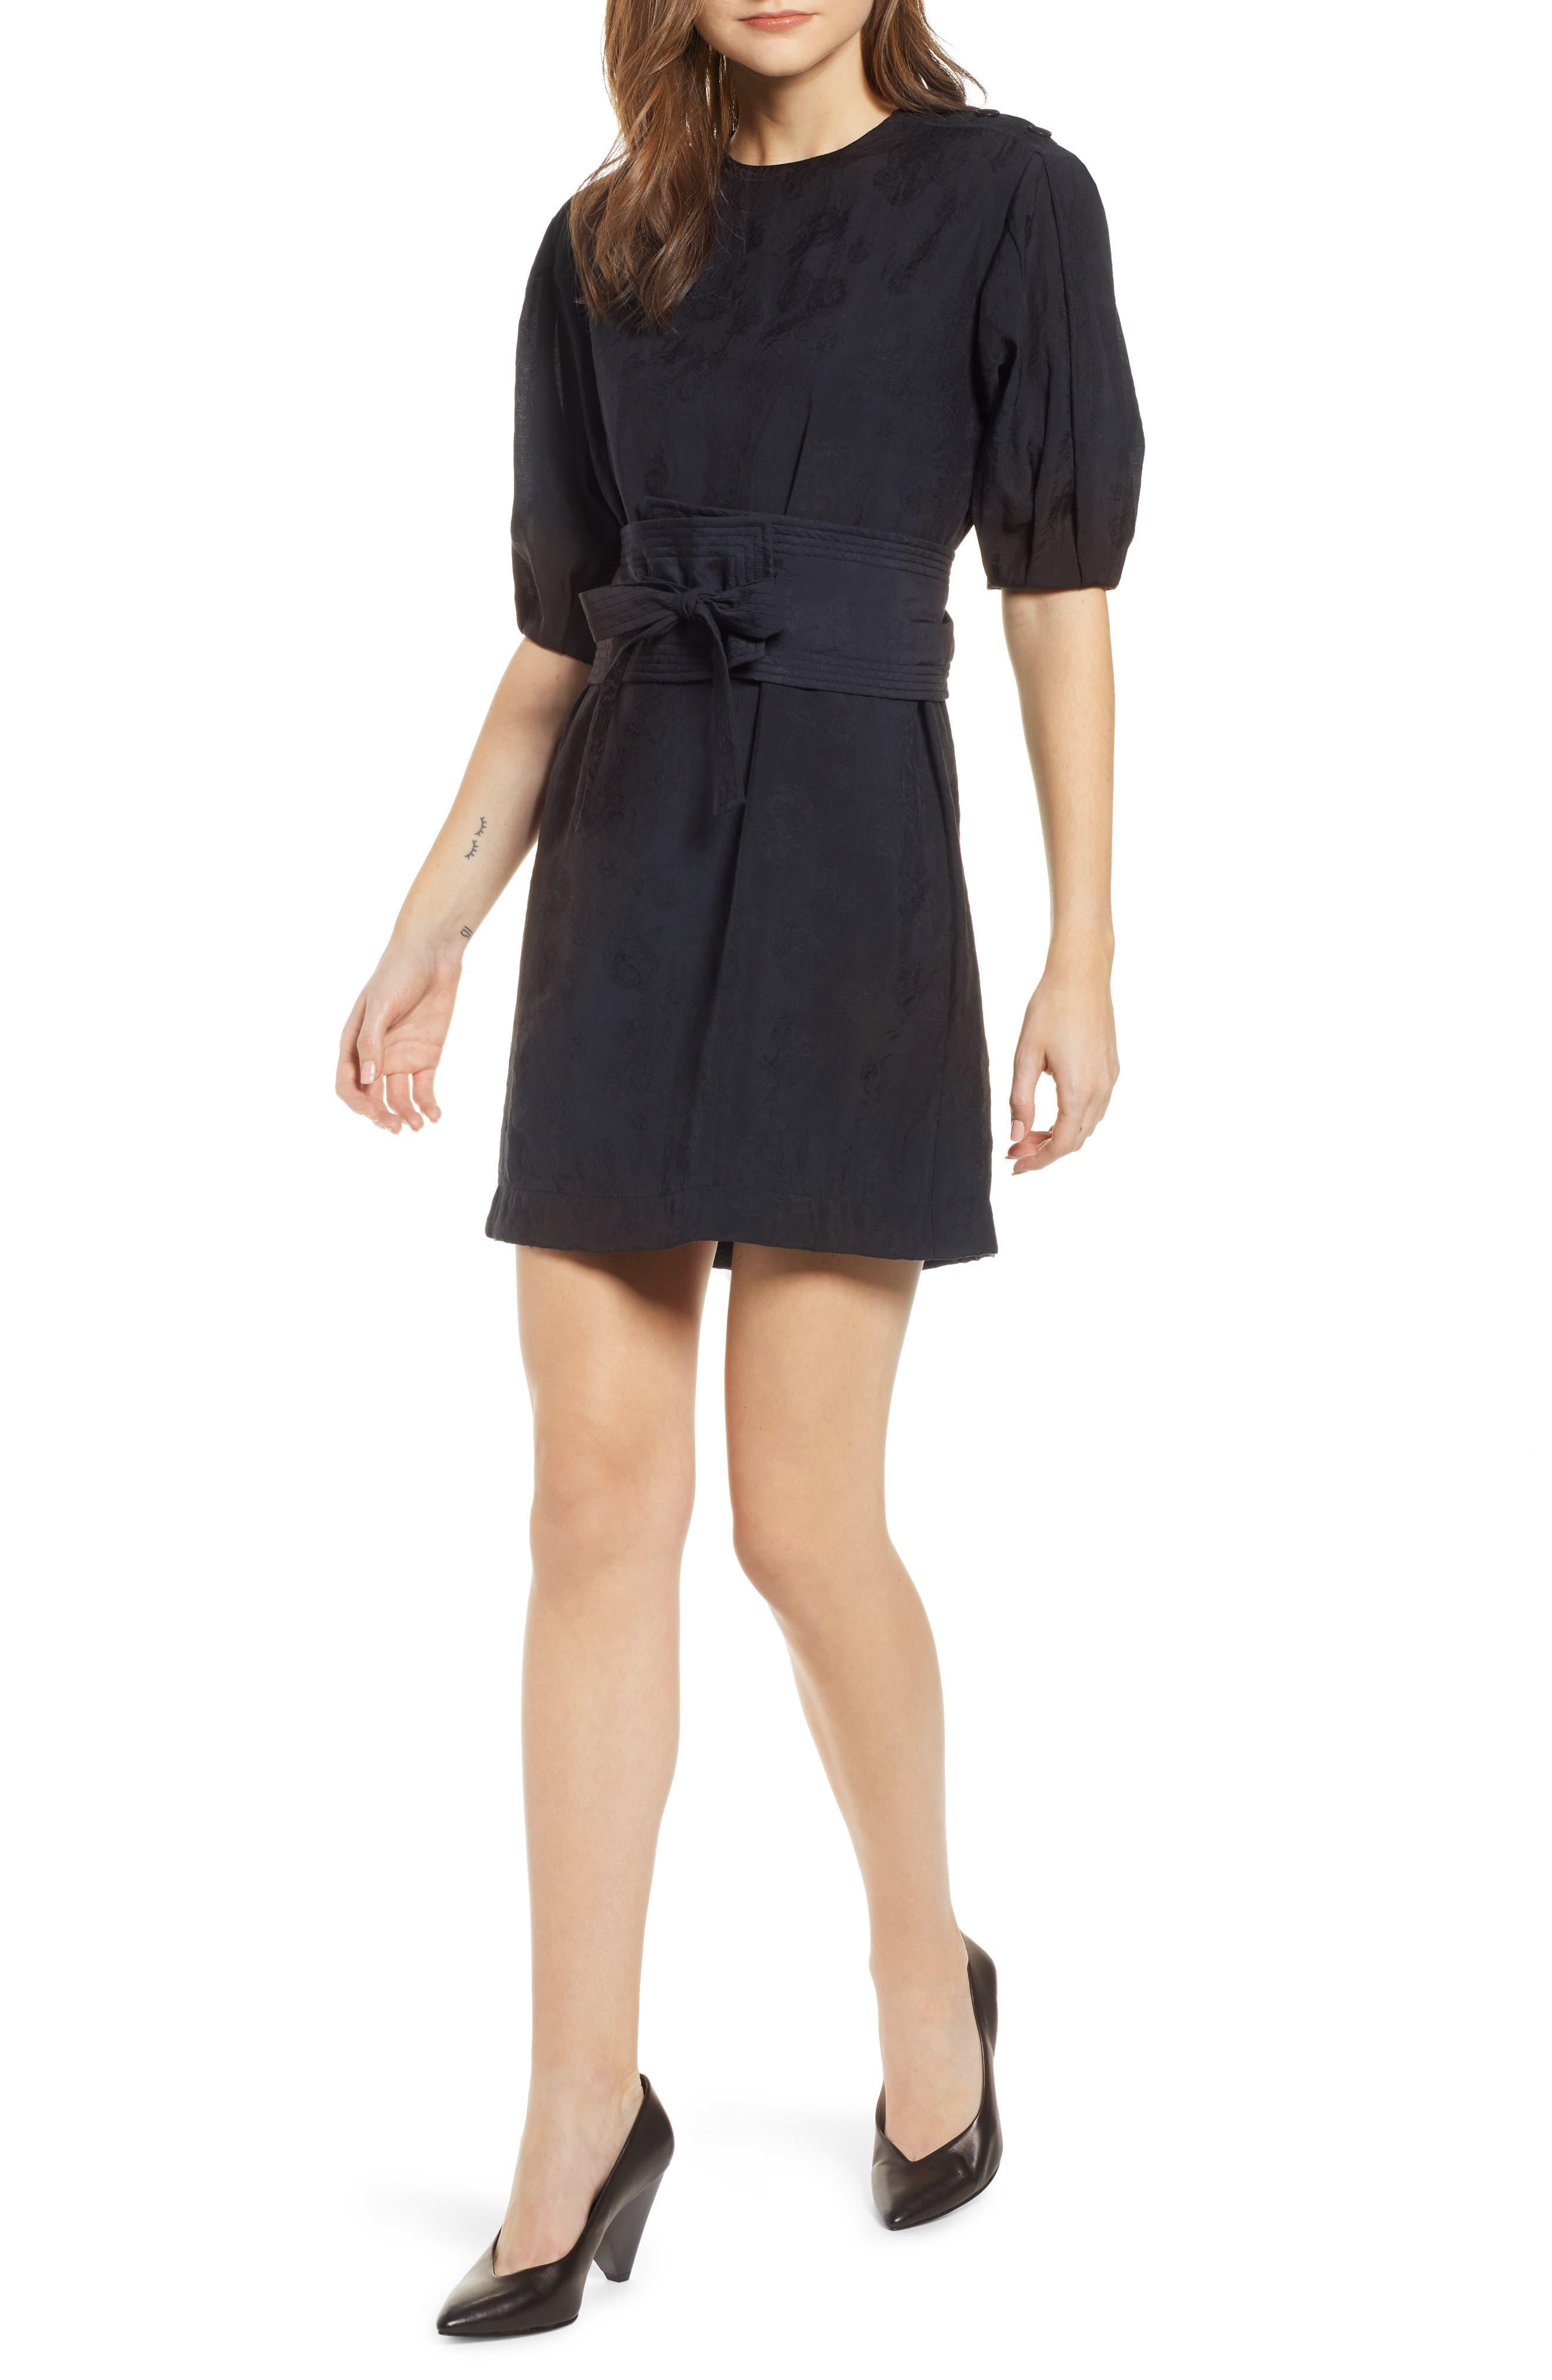 Rebecca Minkoff Juno Dress, Black